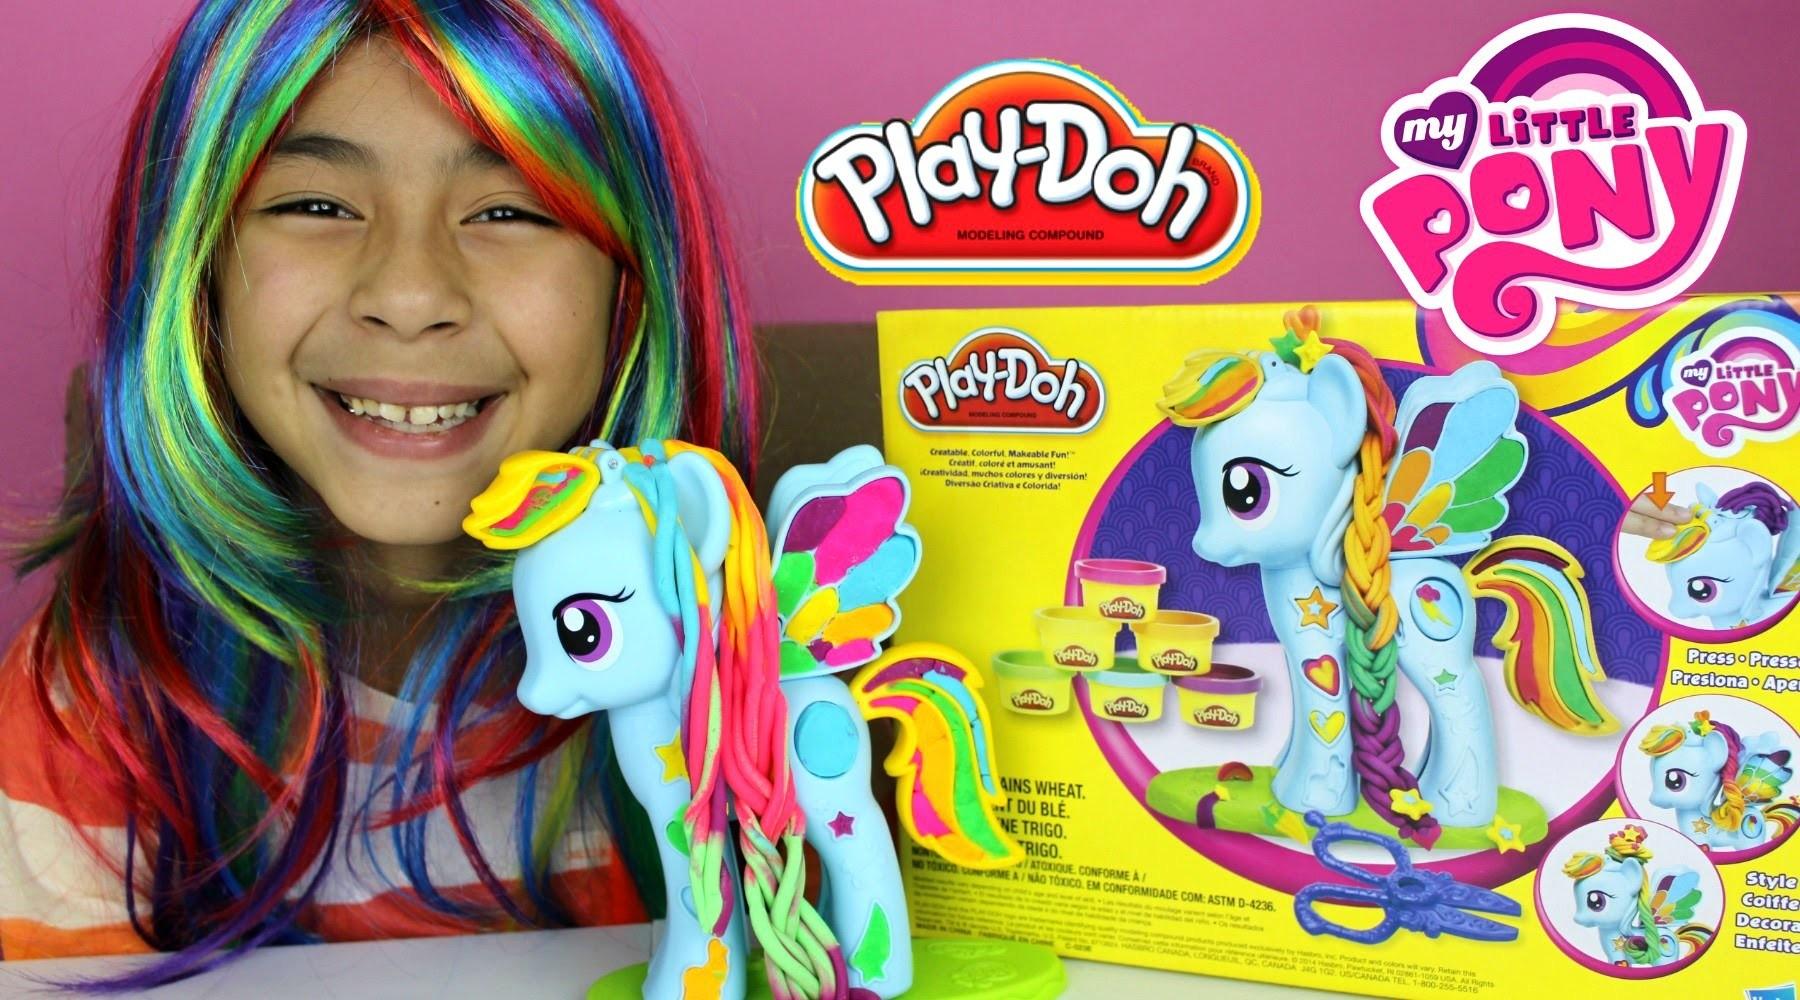 Tuesday Play Doh My Little Pony Rainbow Dash Style Salon |My Little Pony Play-Doh